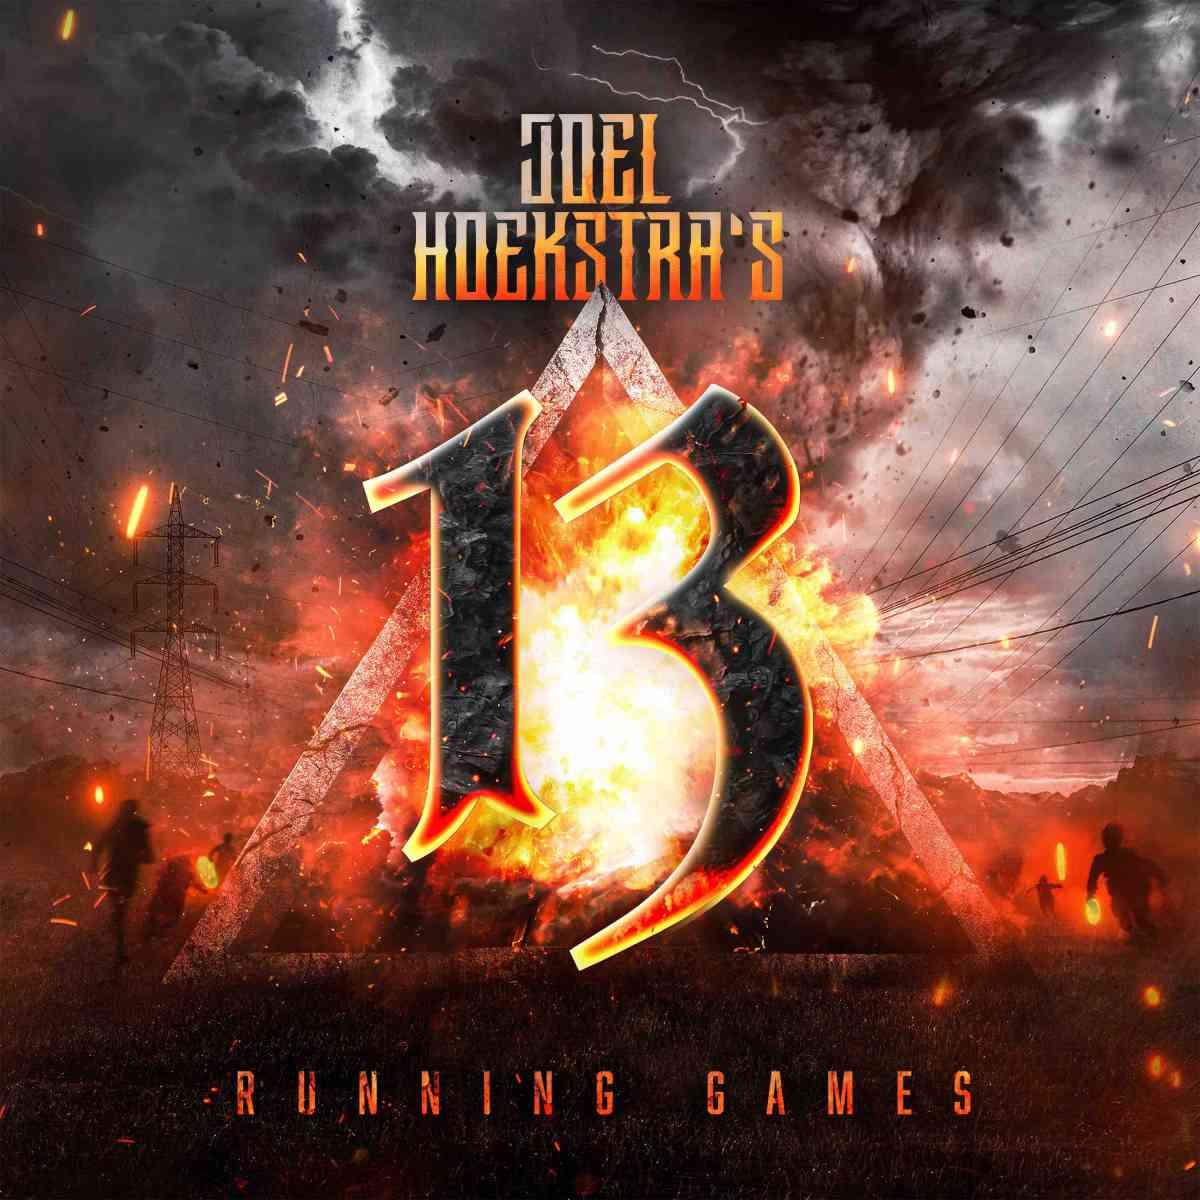 JOEL HOEKSTRAS 13 - running games - album cover